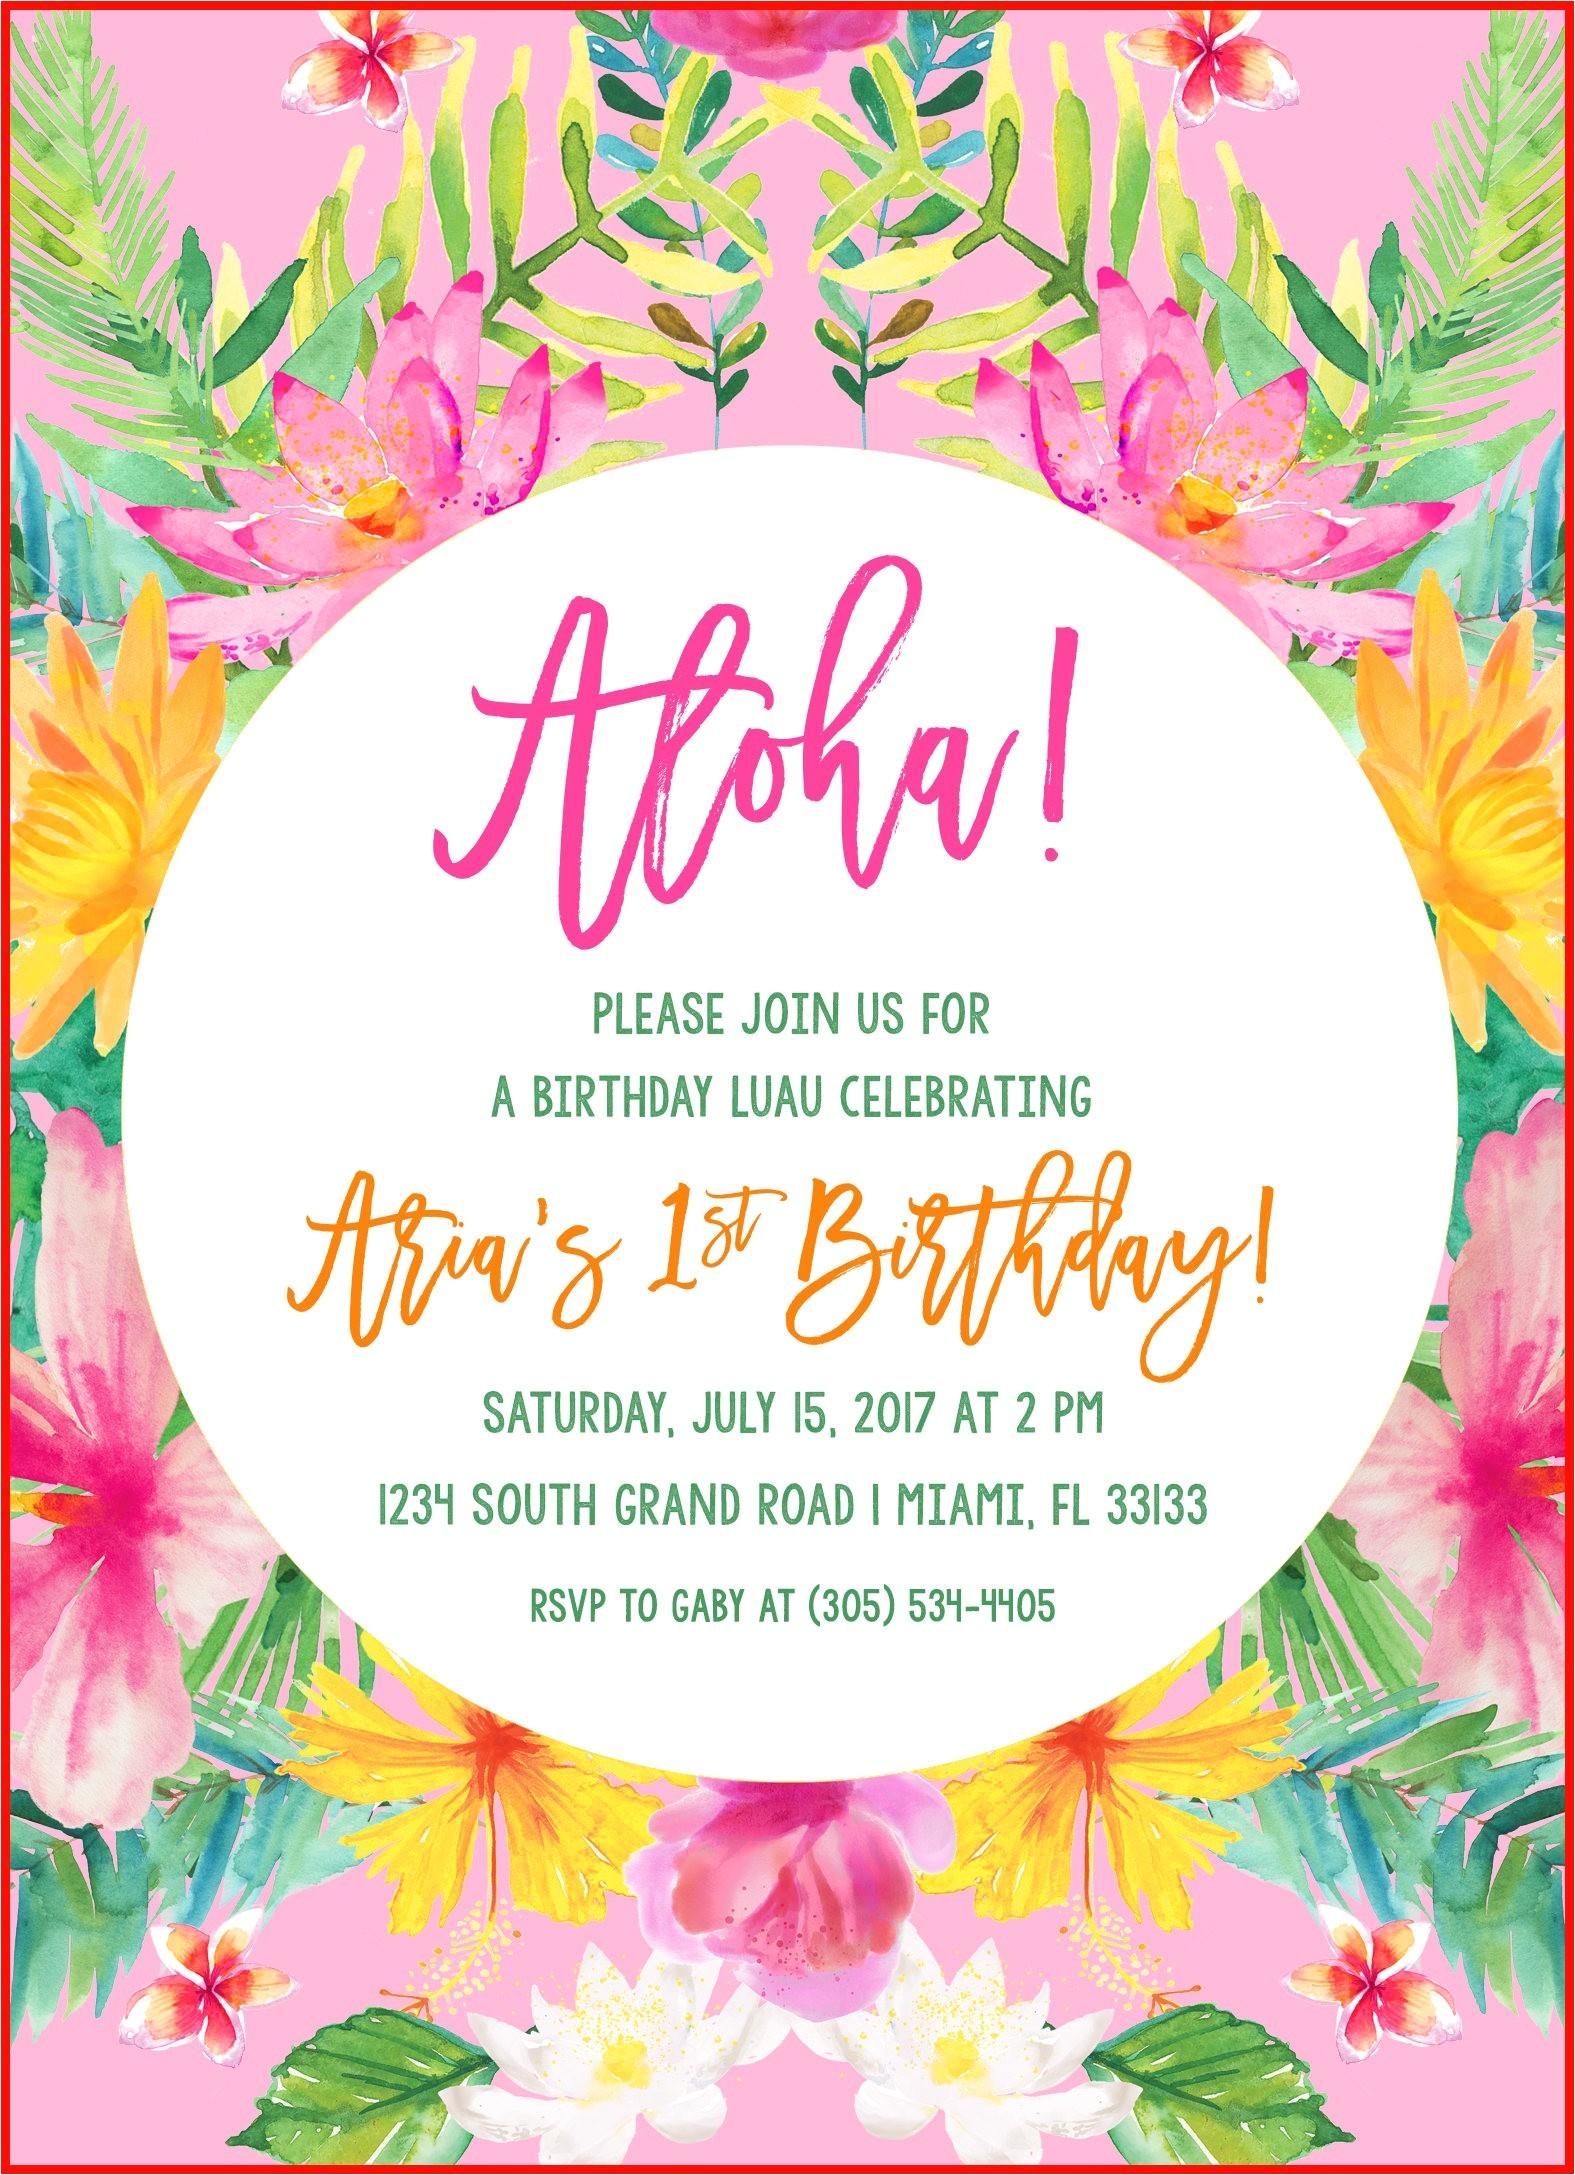 luau invites 32401 tropical birthday invitation luau birthday invitation first 1st